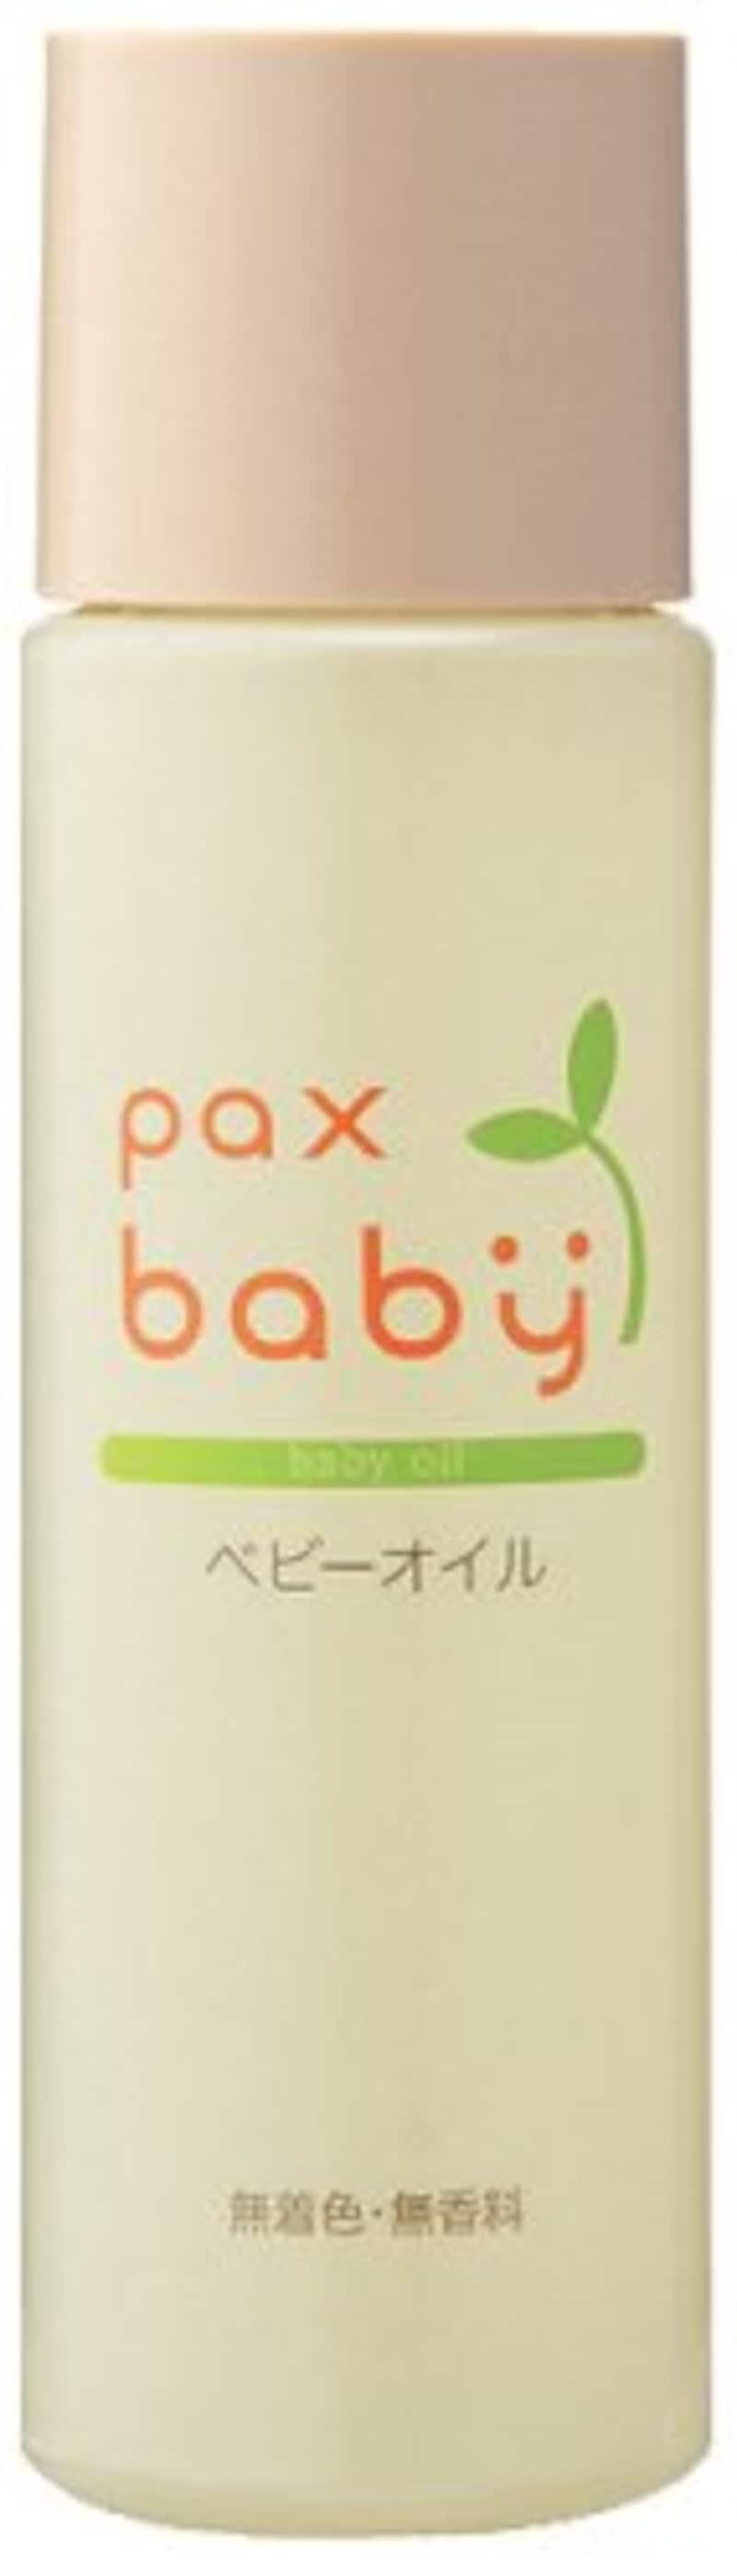 PAX BABY(パックスベビー),ベビー オイル, 812527513-1-a